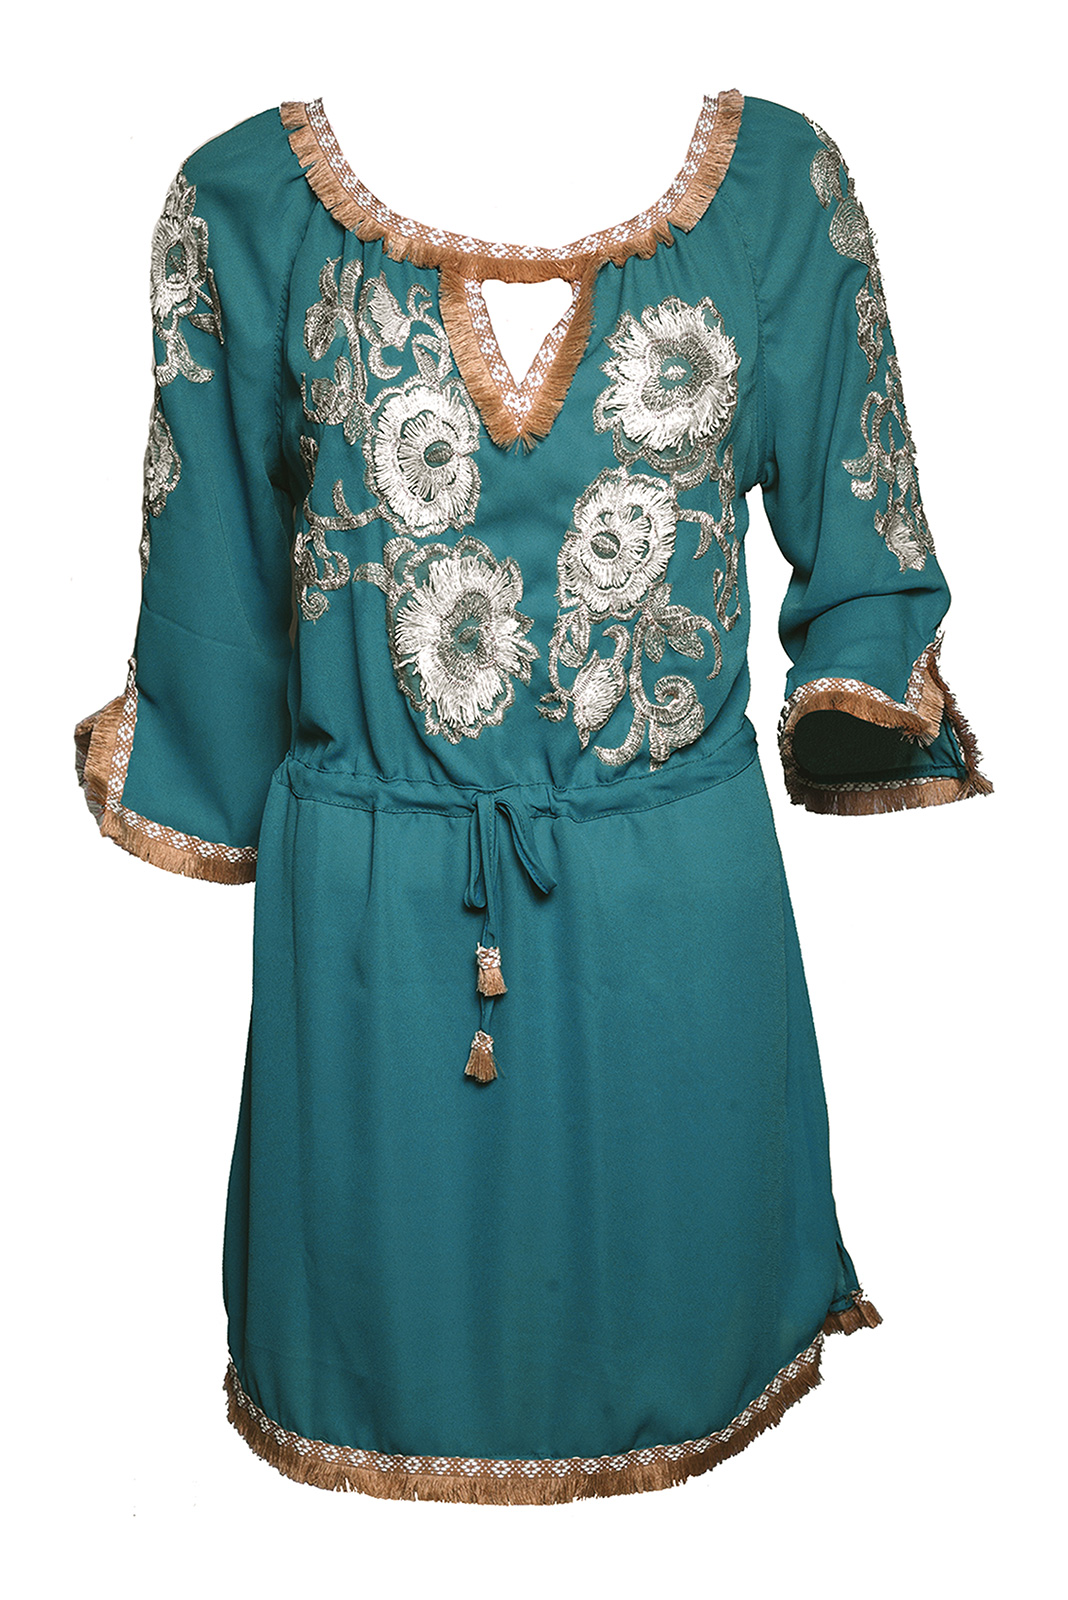 08c3d099d25 Green Flower-embroidered Beach Dress - Dandelion Tunic - Despi